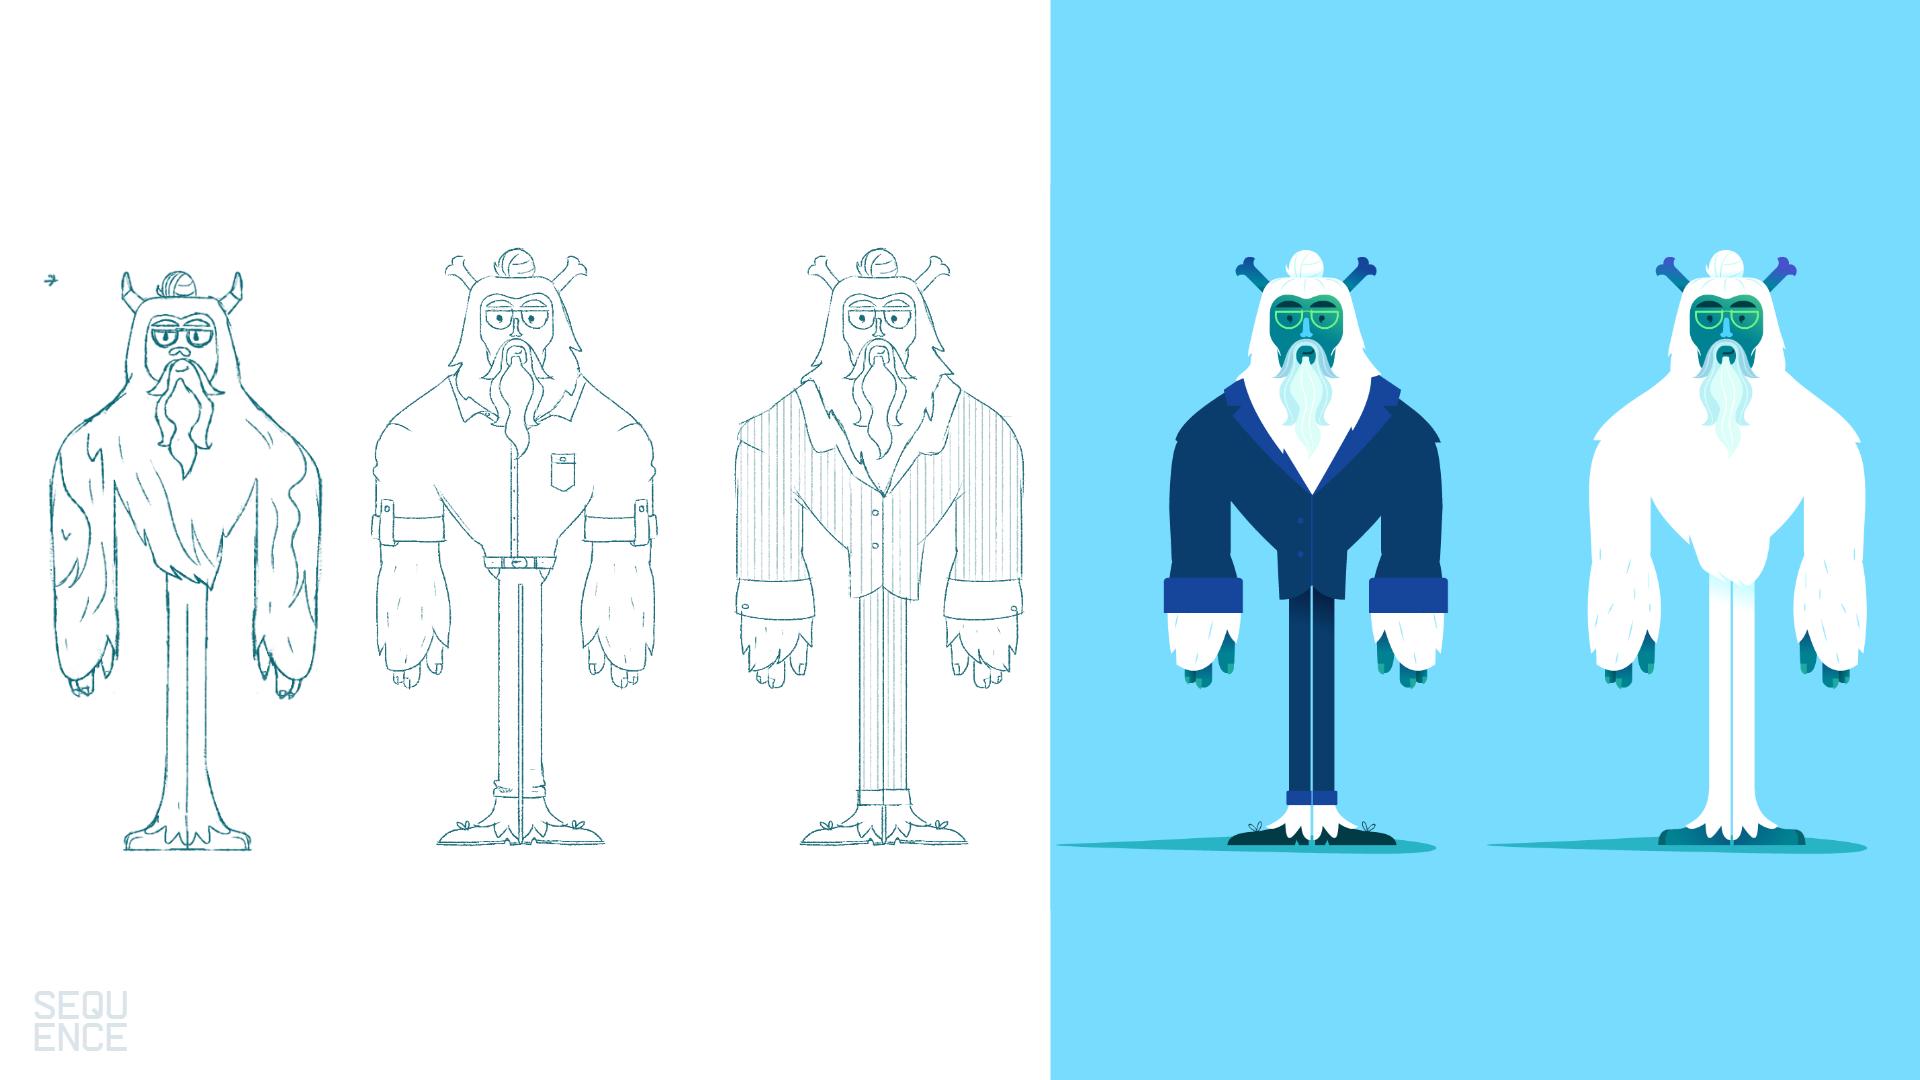 yetee_hero_design_sketches.png